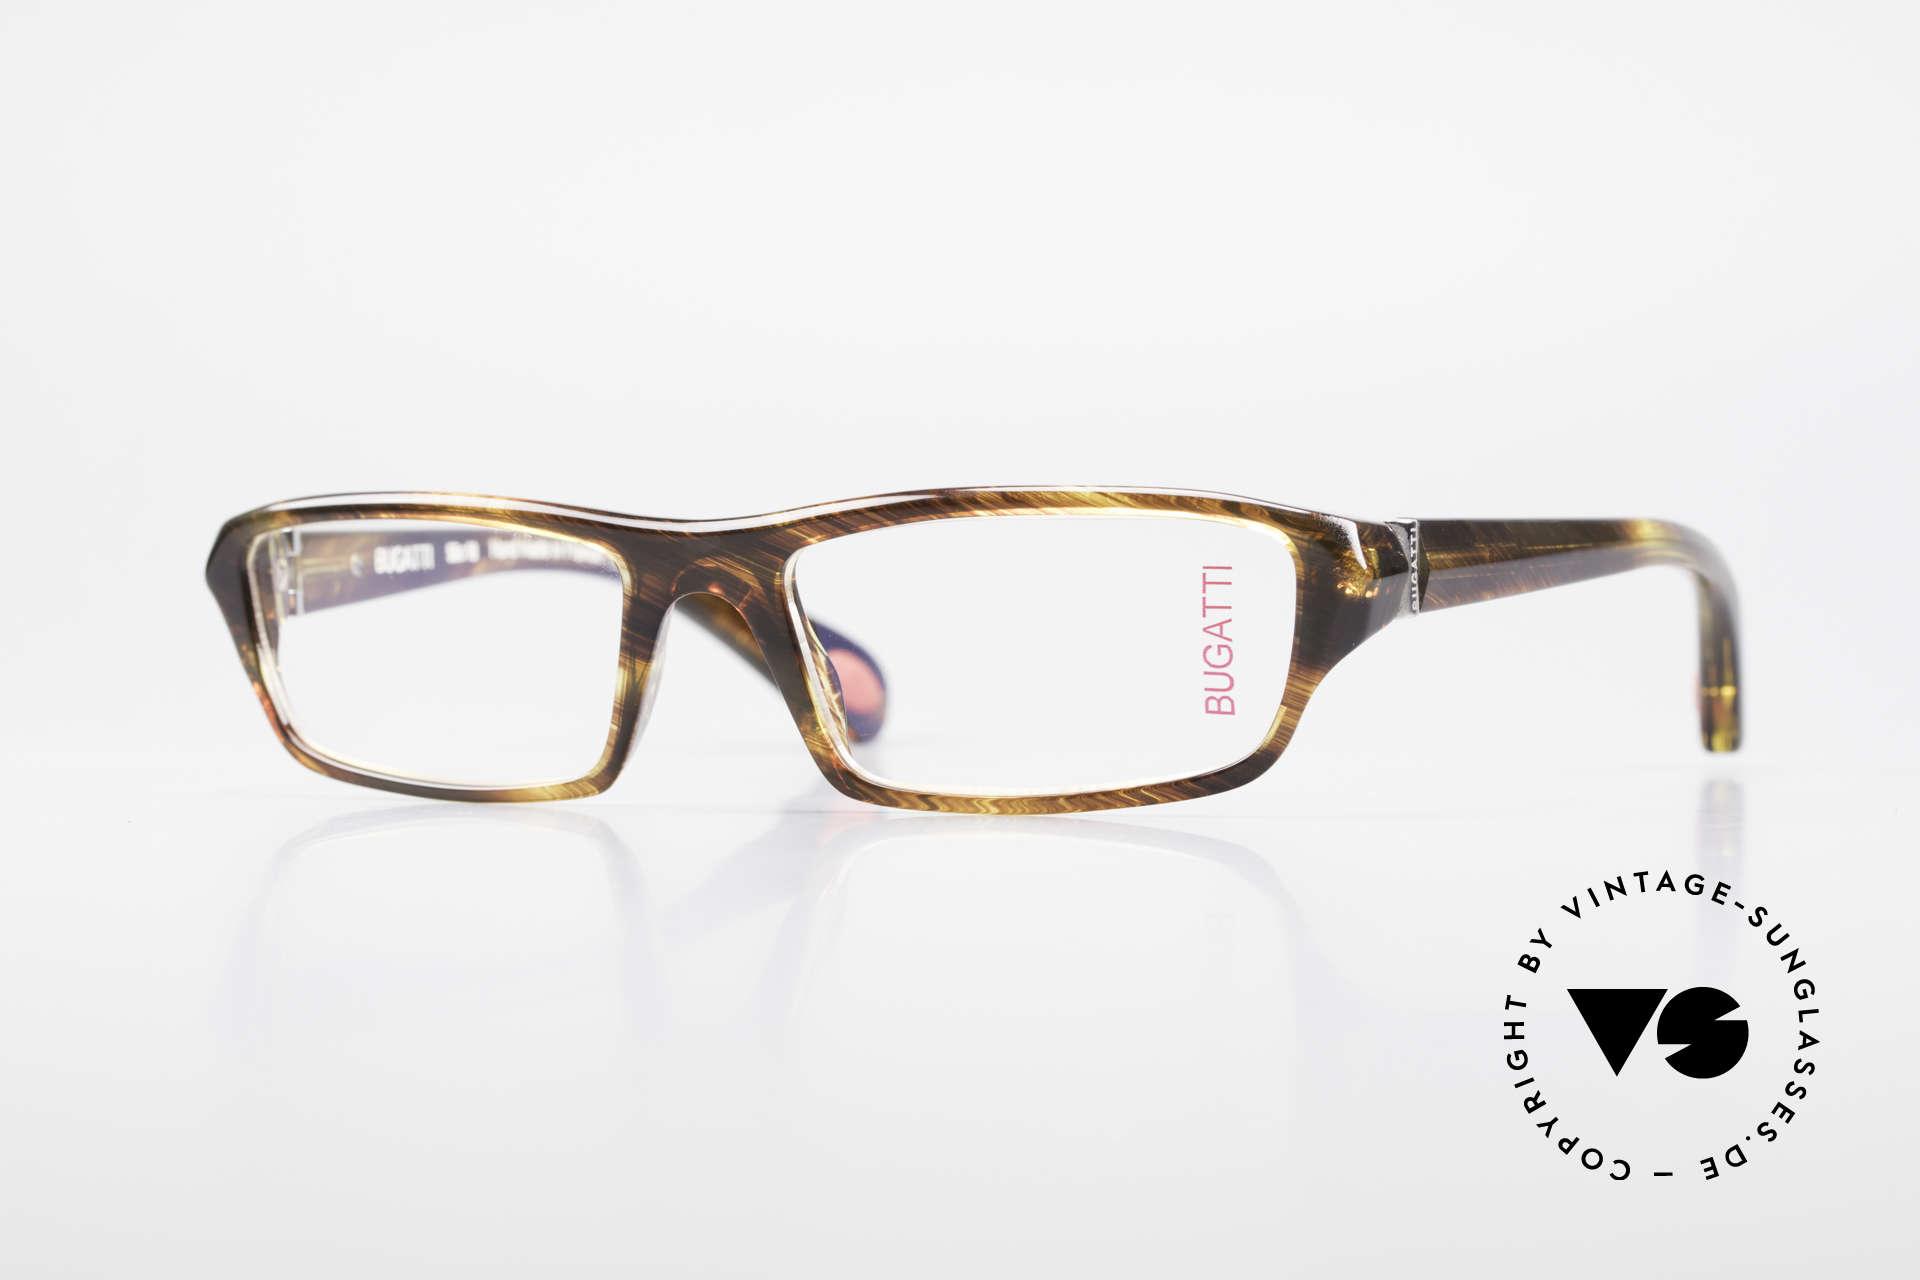 Bugatti 470 Rare Designer Eyeglasses Men, classic high-tech eyeglass-frame by BUGATTI, Made for Men